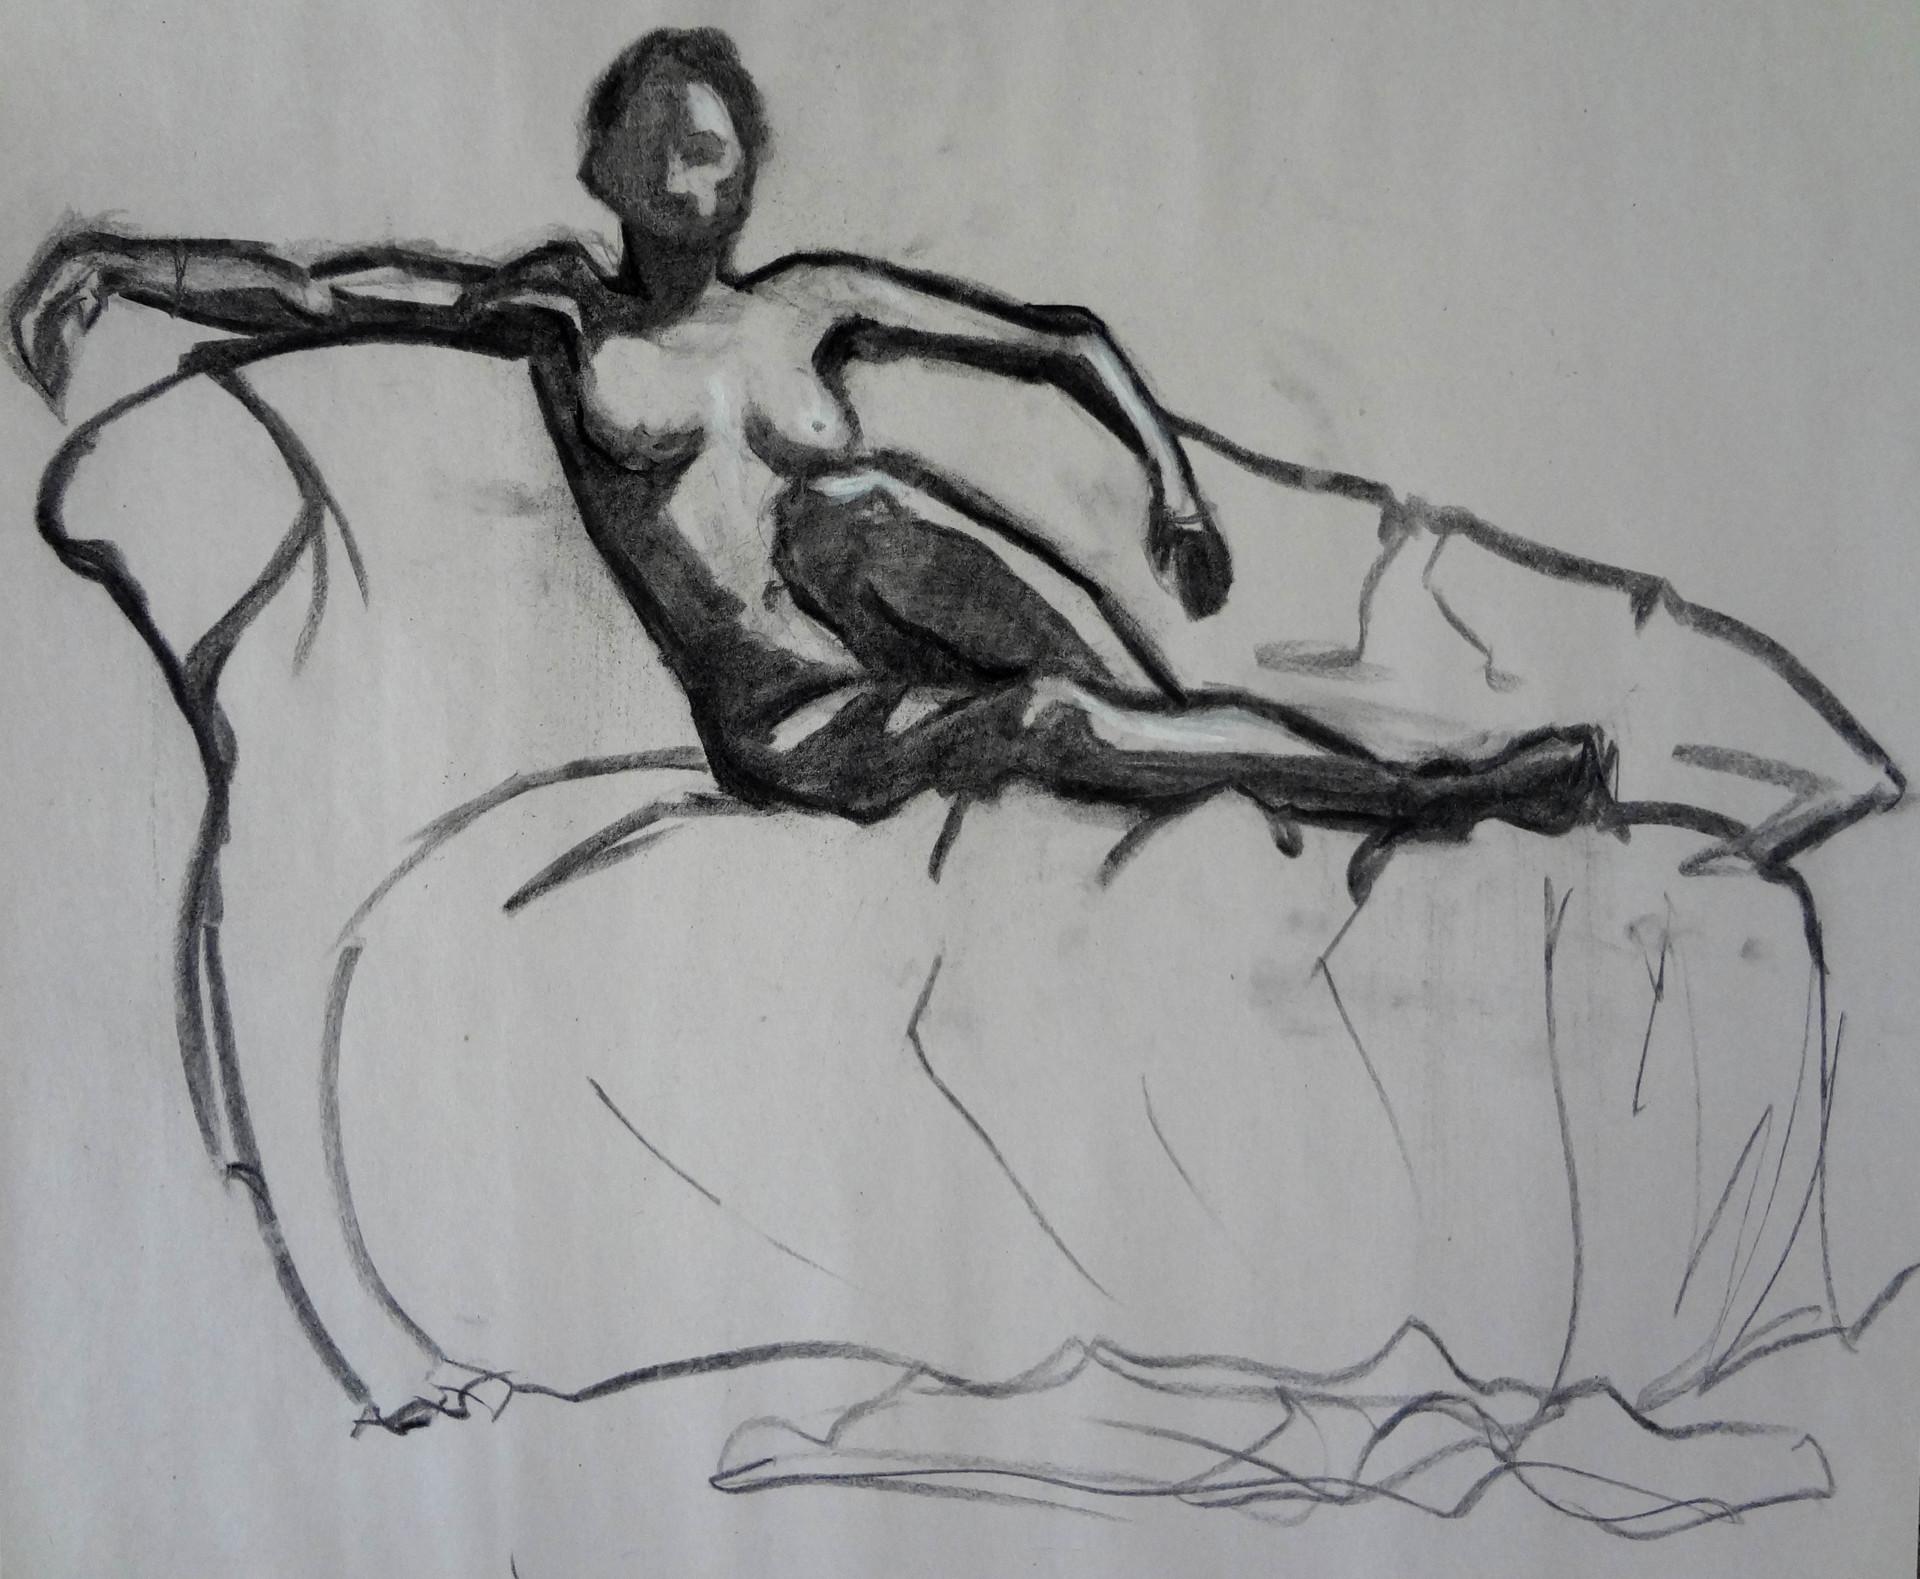 Marie angoulvant nichole05